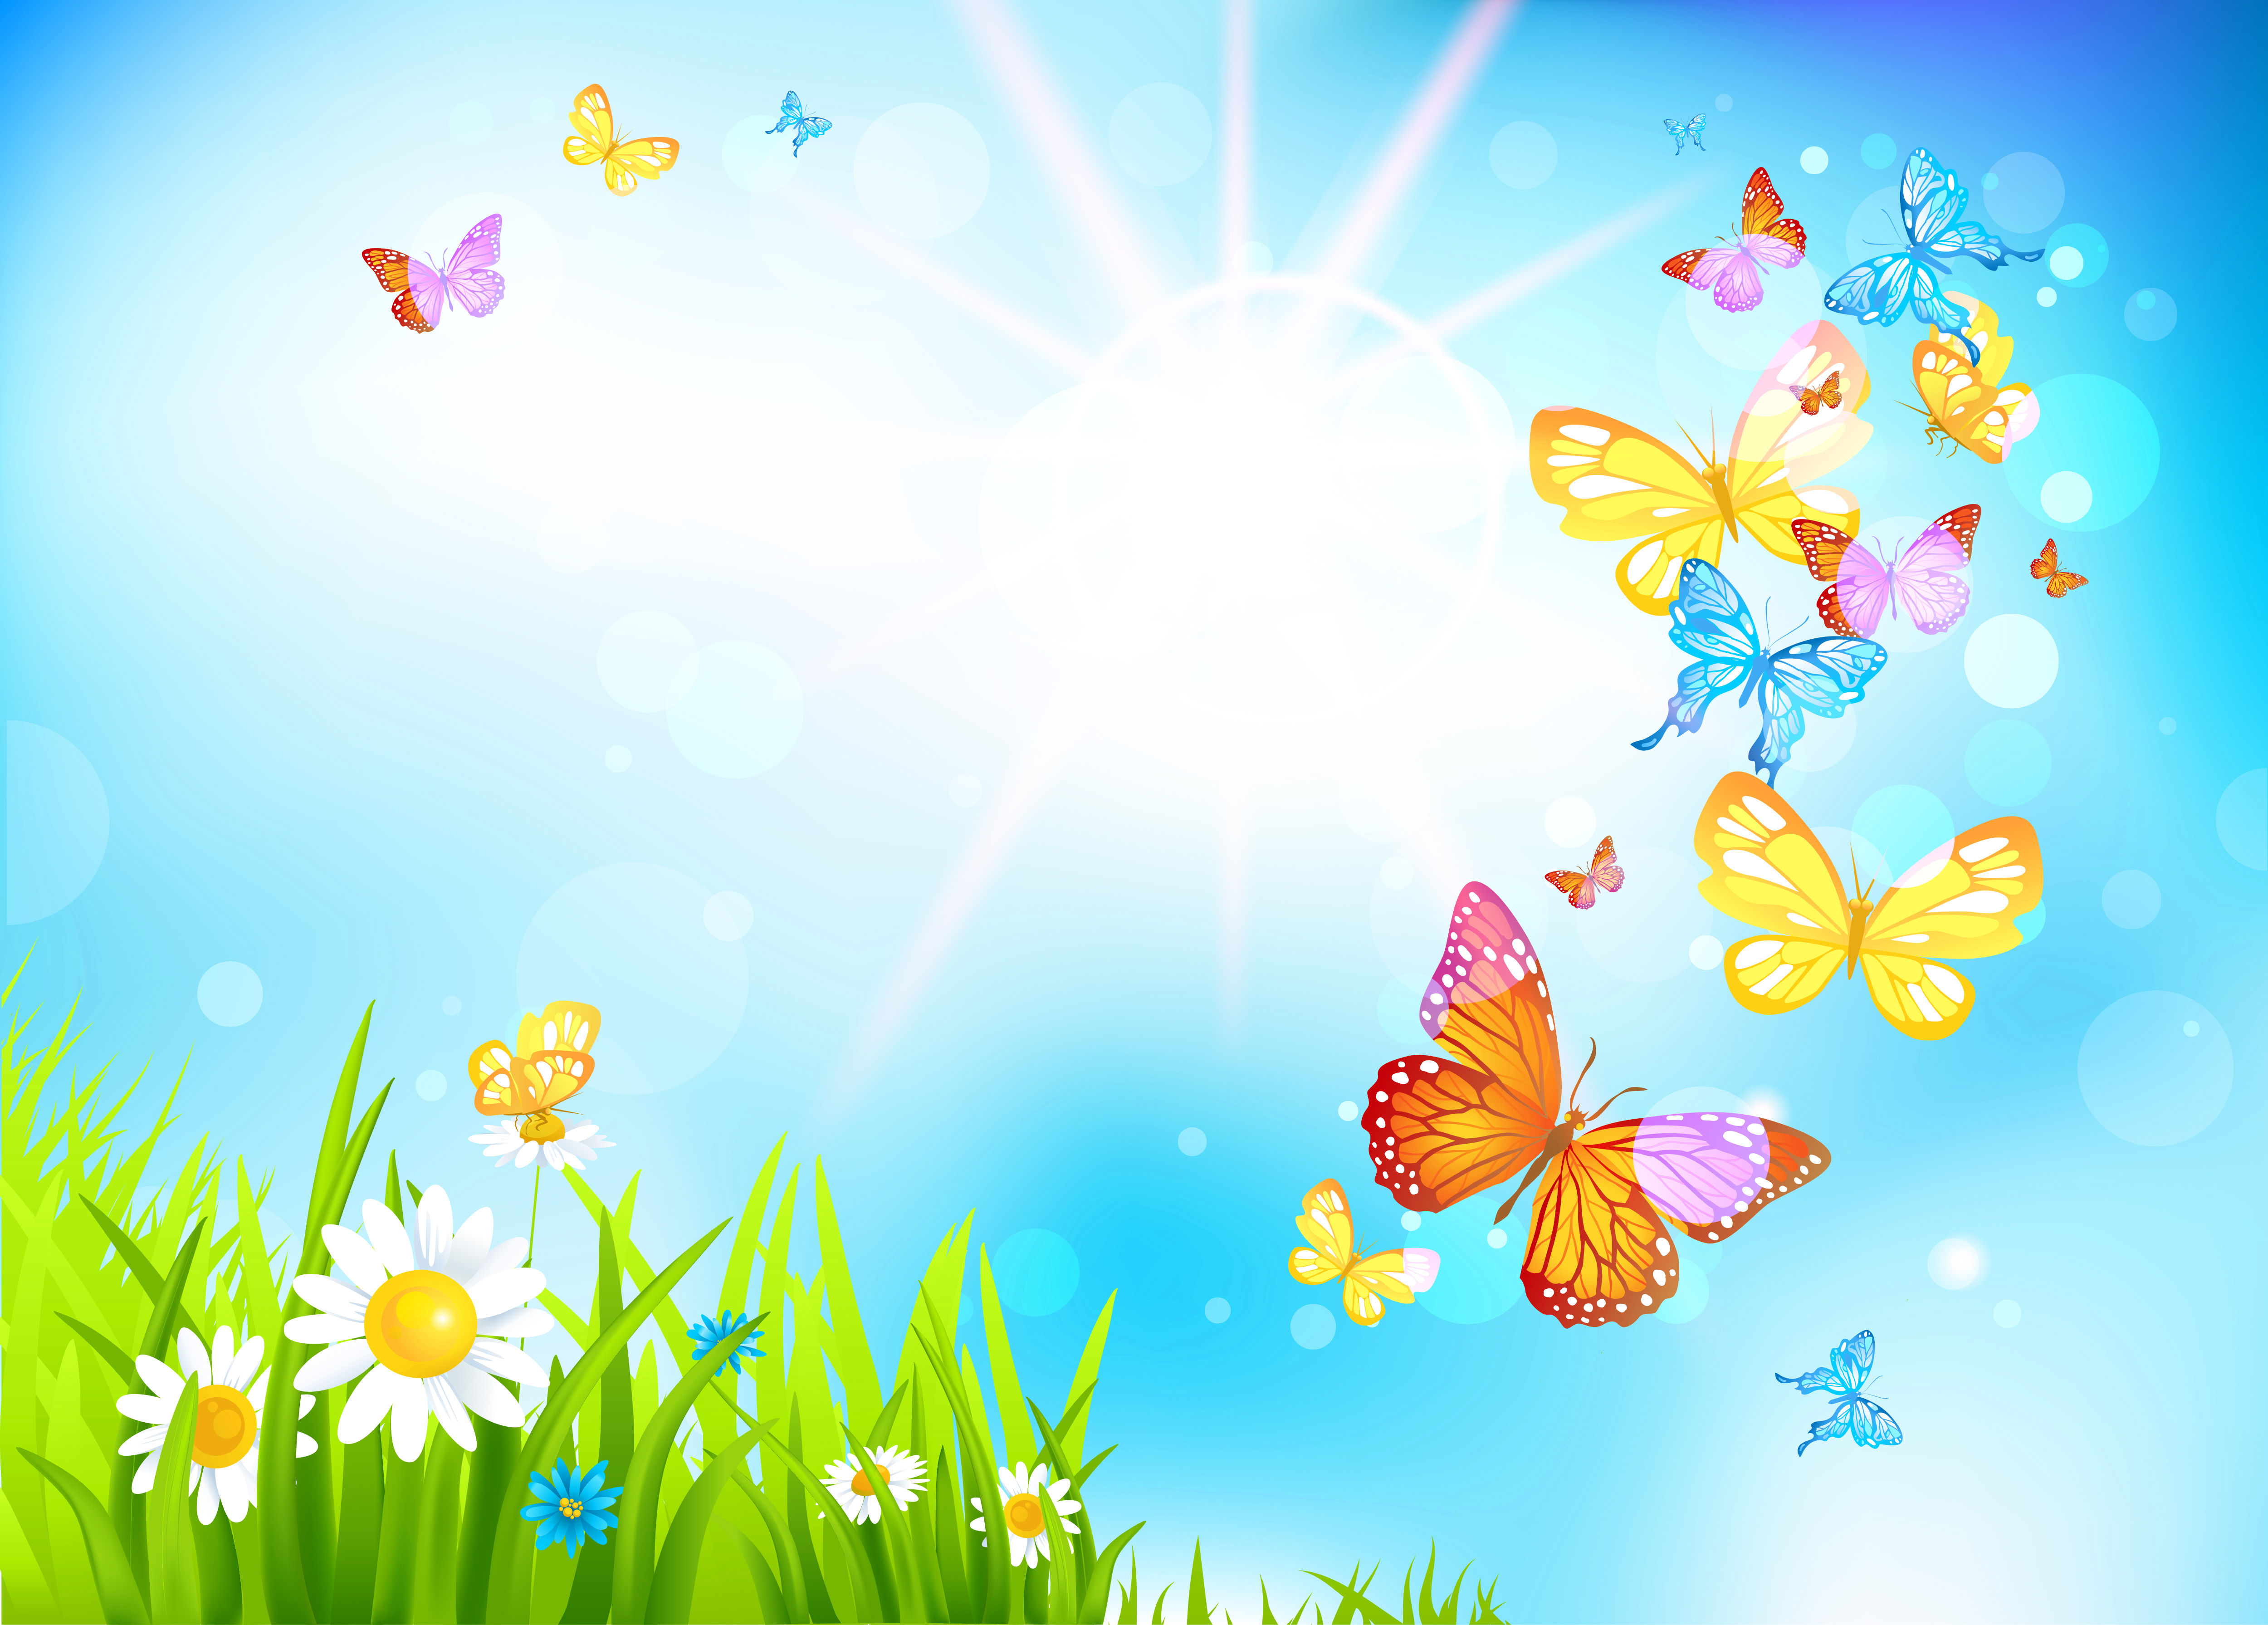 Butterflies clipart summer flower. Spring background gallery yopriceville